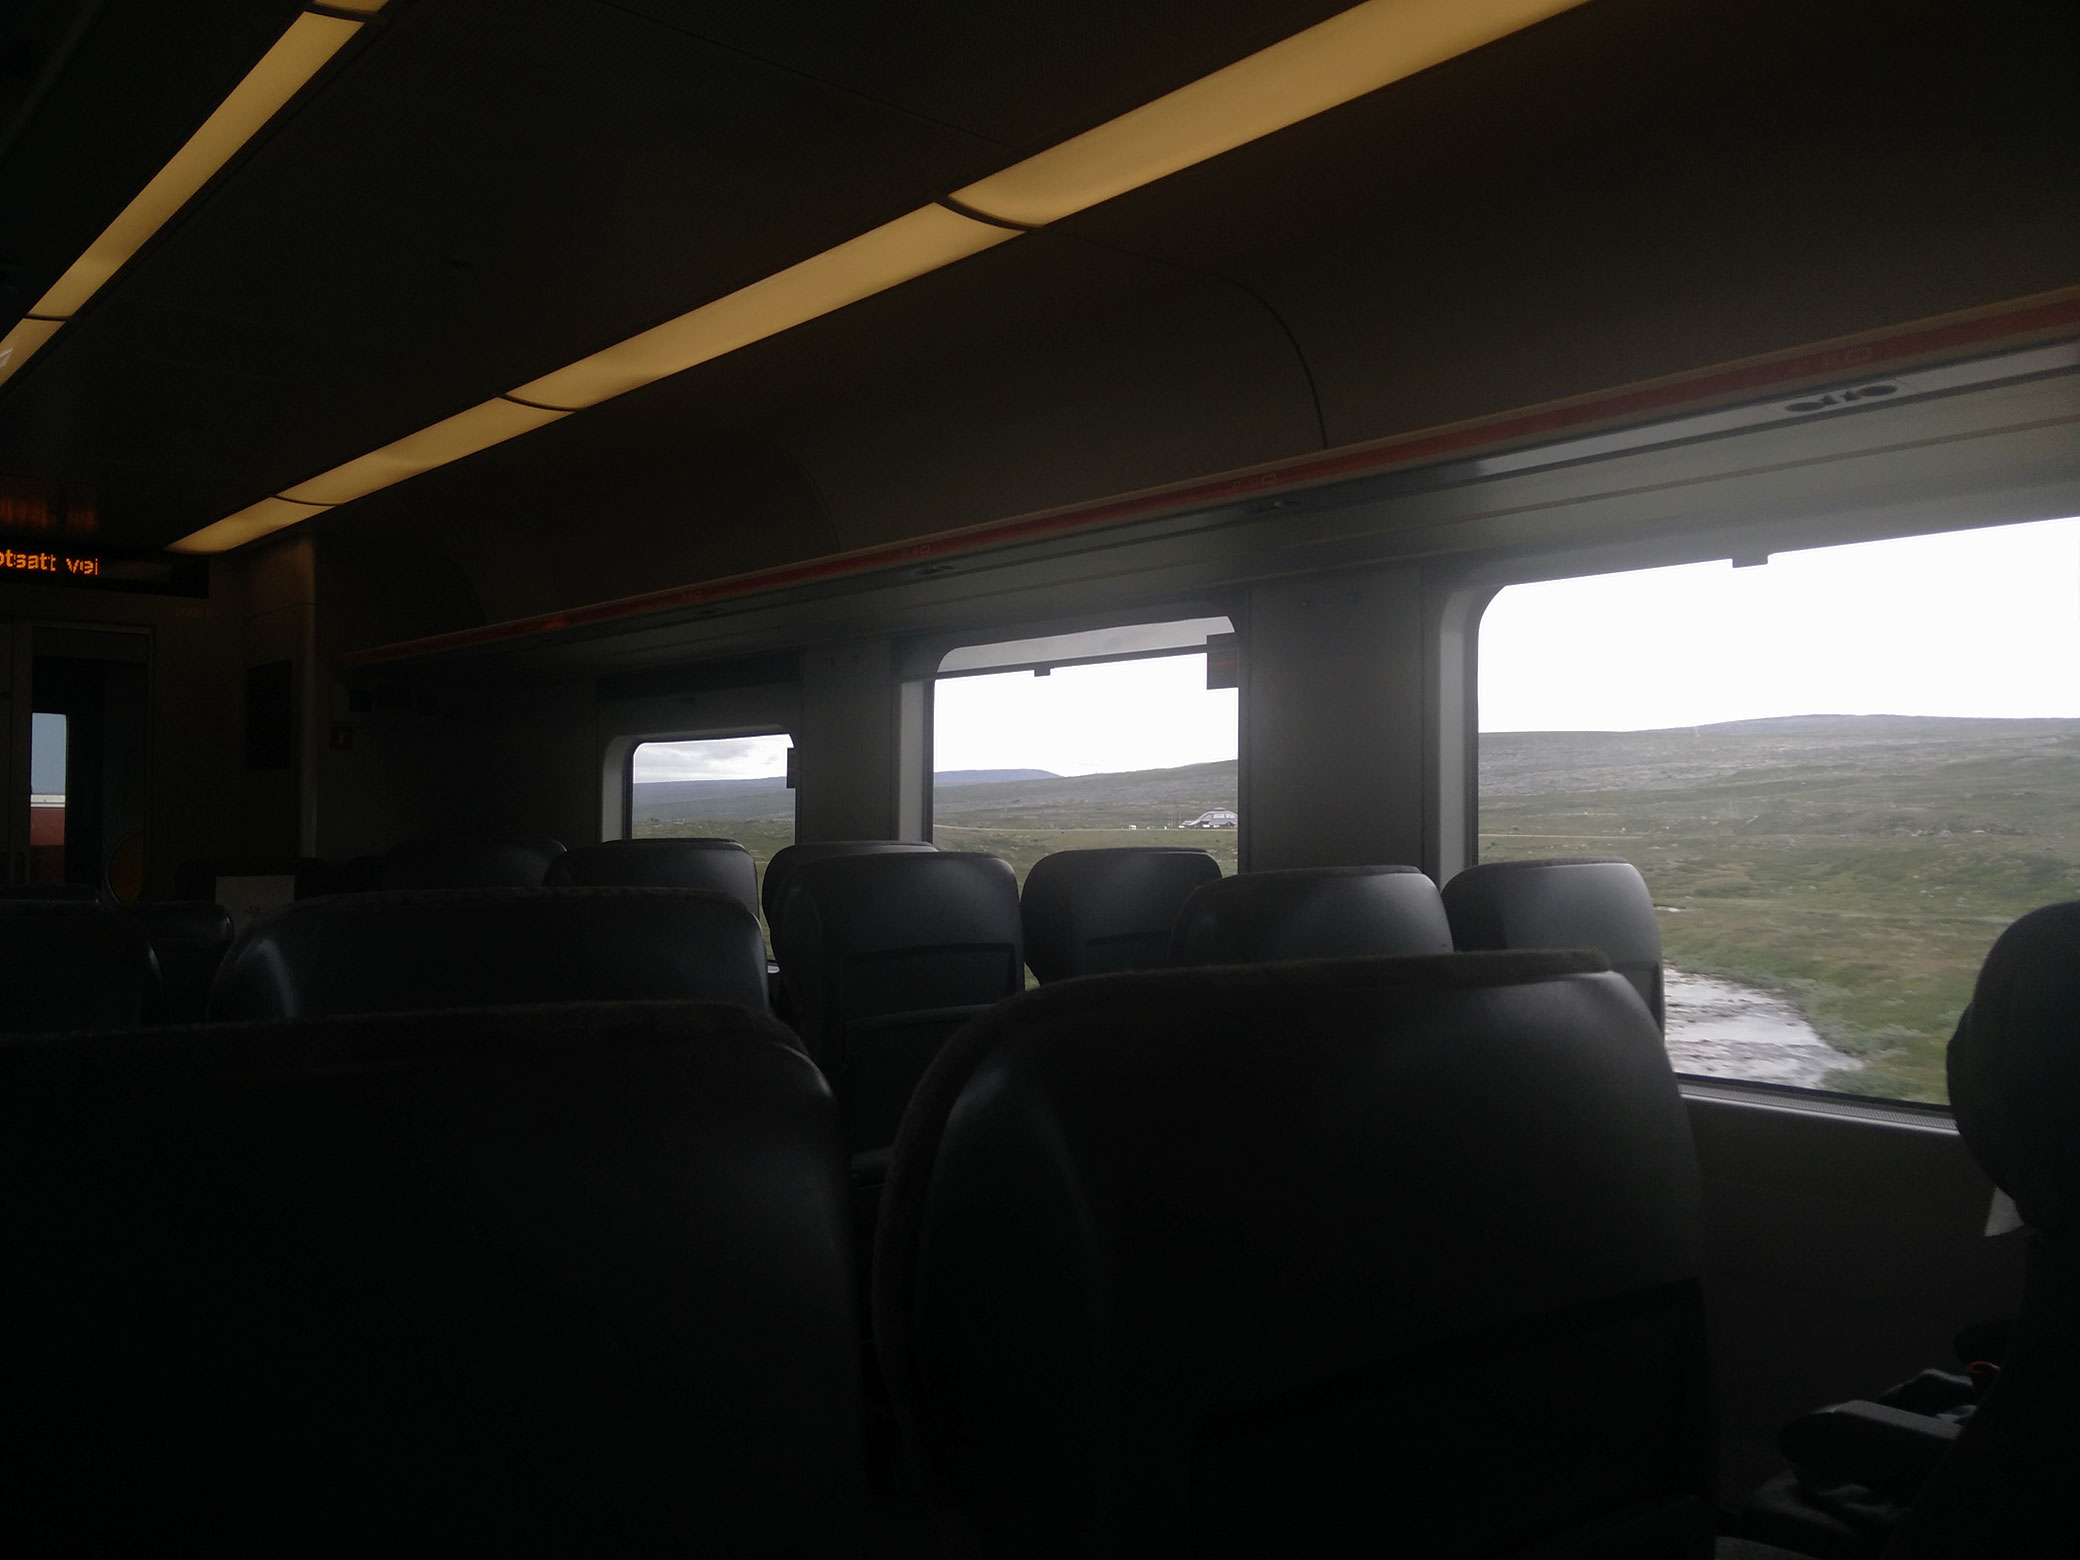 Travel to Lofoten Island